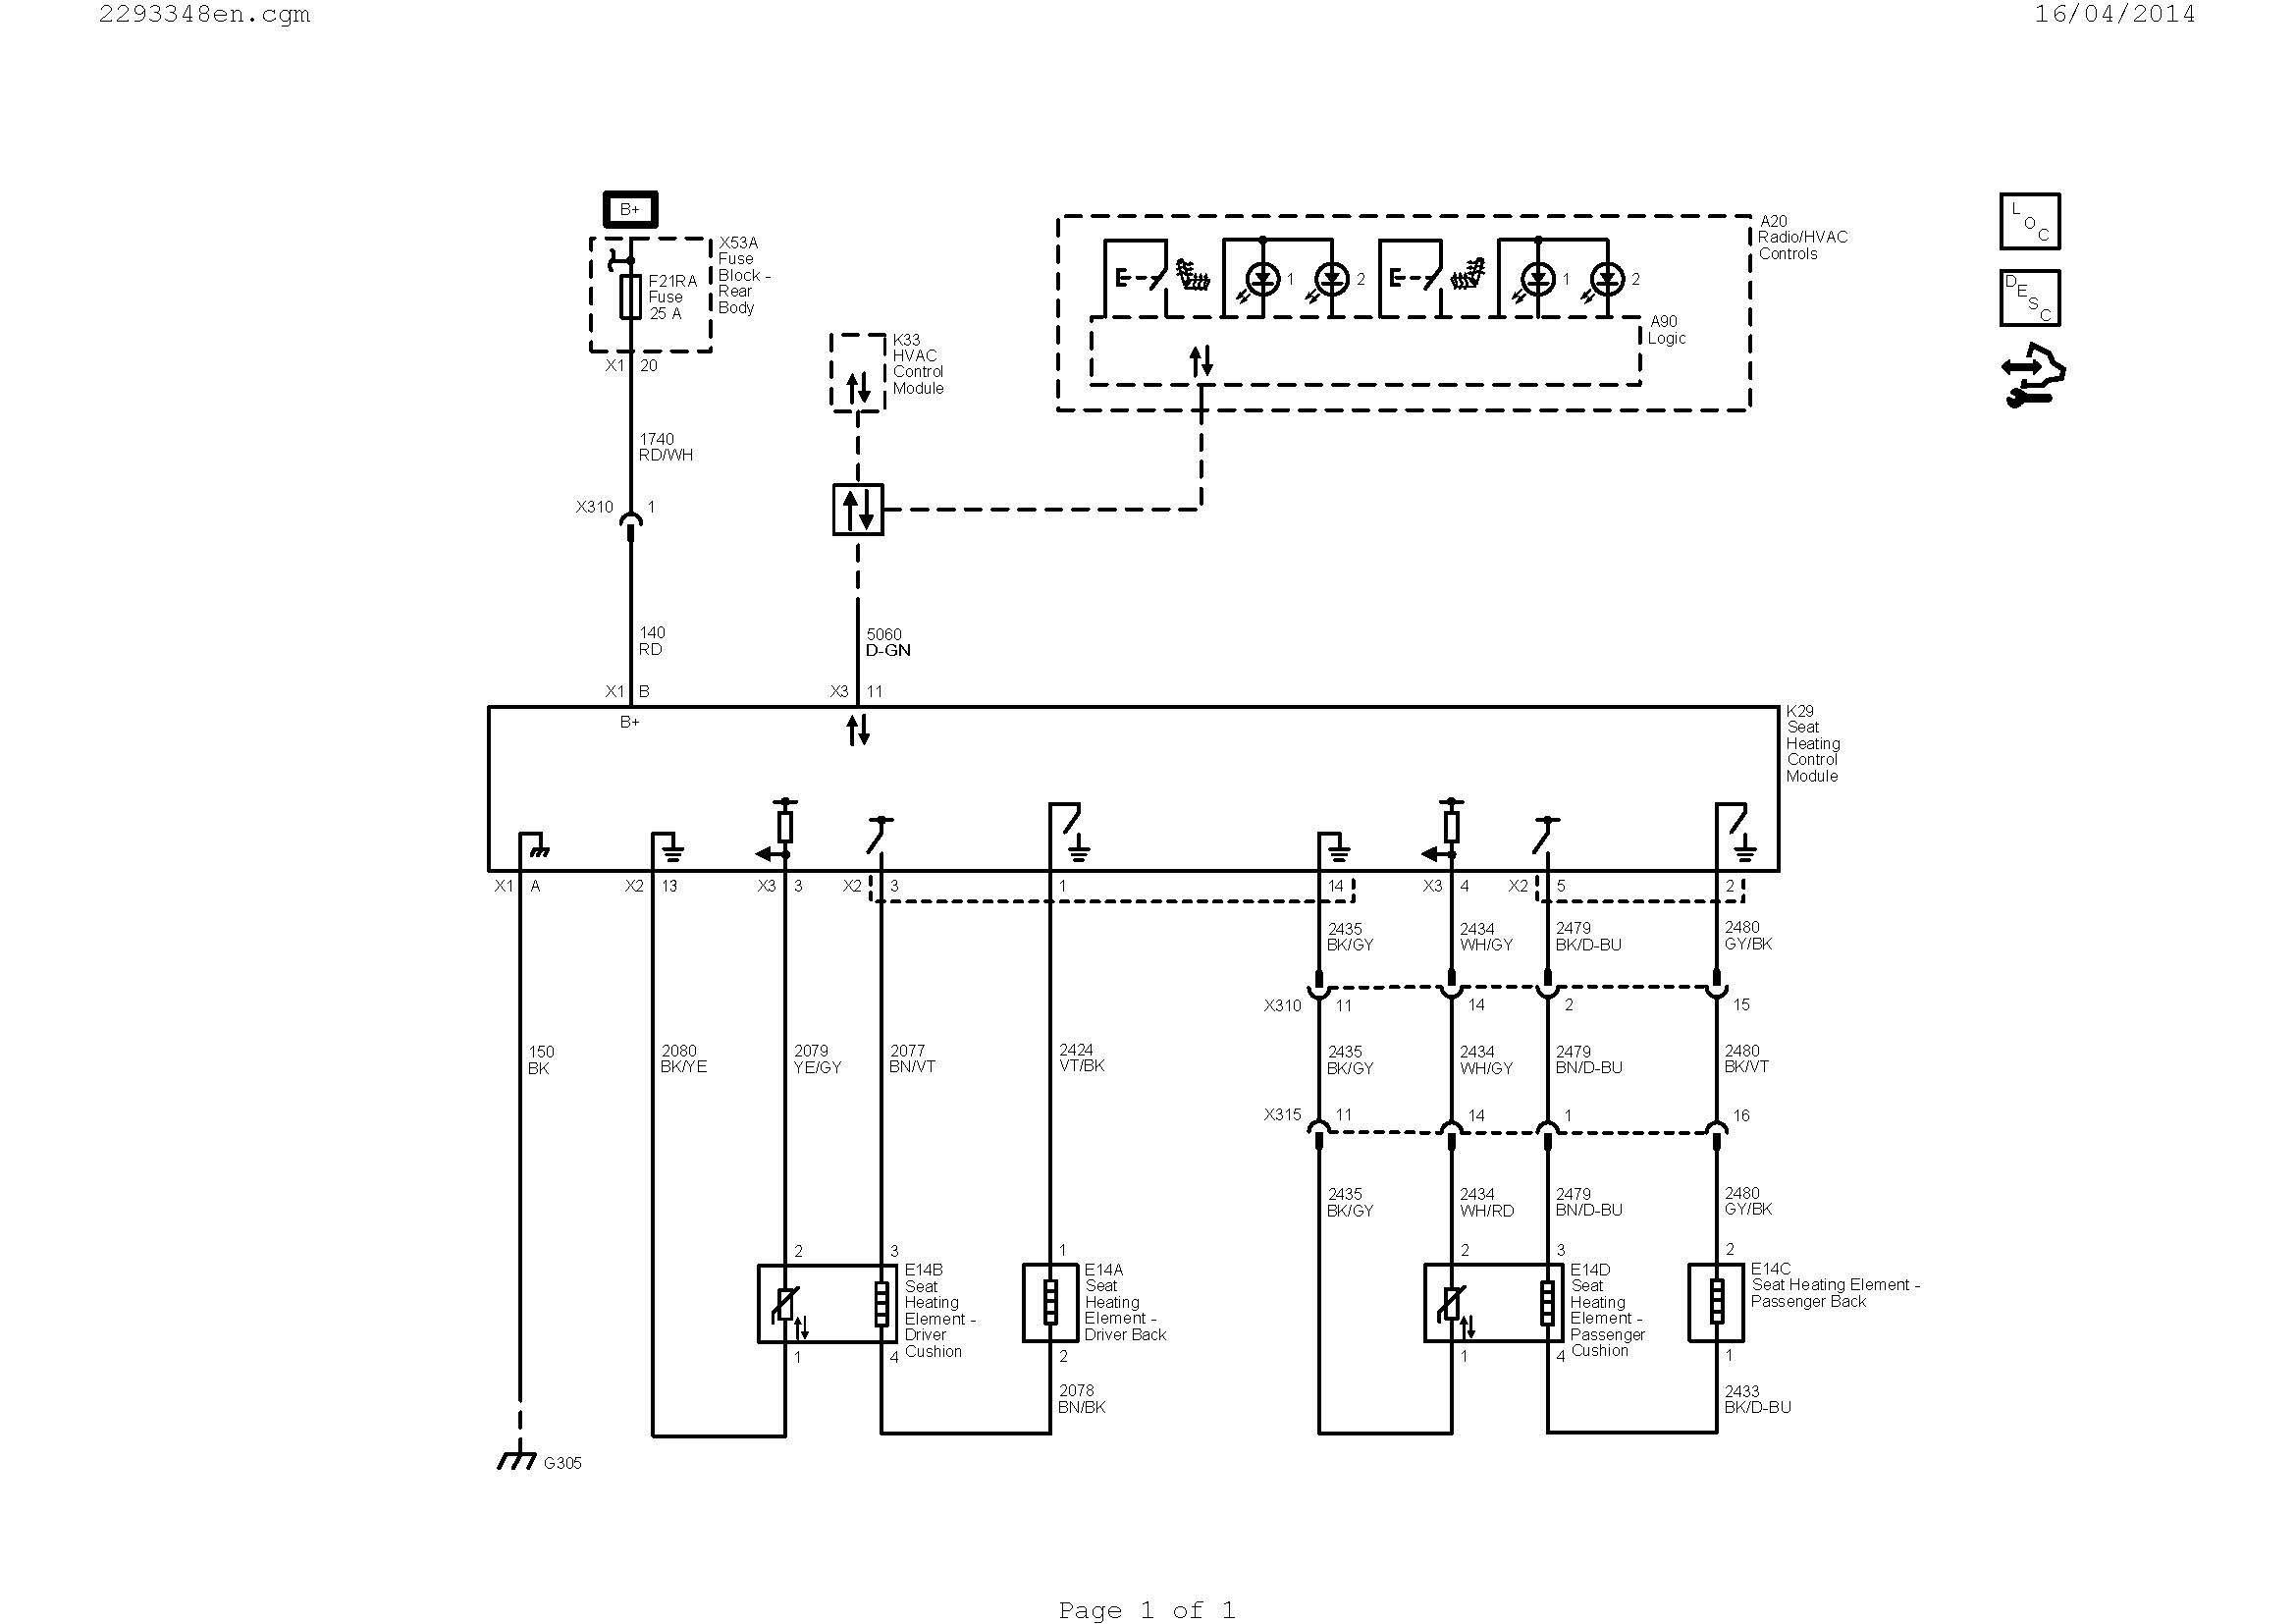 kohler wiring diagram Collection-Wiring Diagram for Kohler Engine Valid Mechanical Engineering Diagrams Hvac Diagram Best Hvac Diagram 0d 19-s